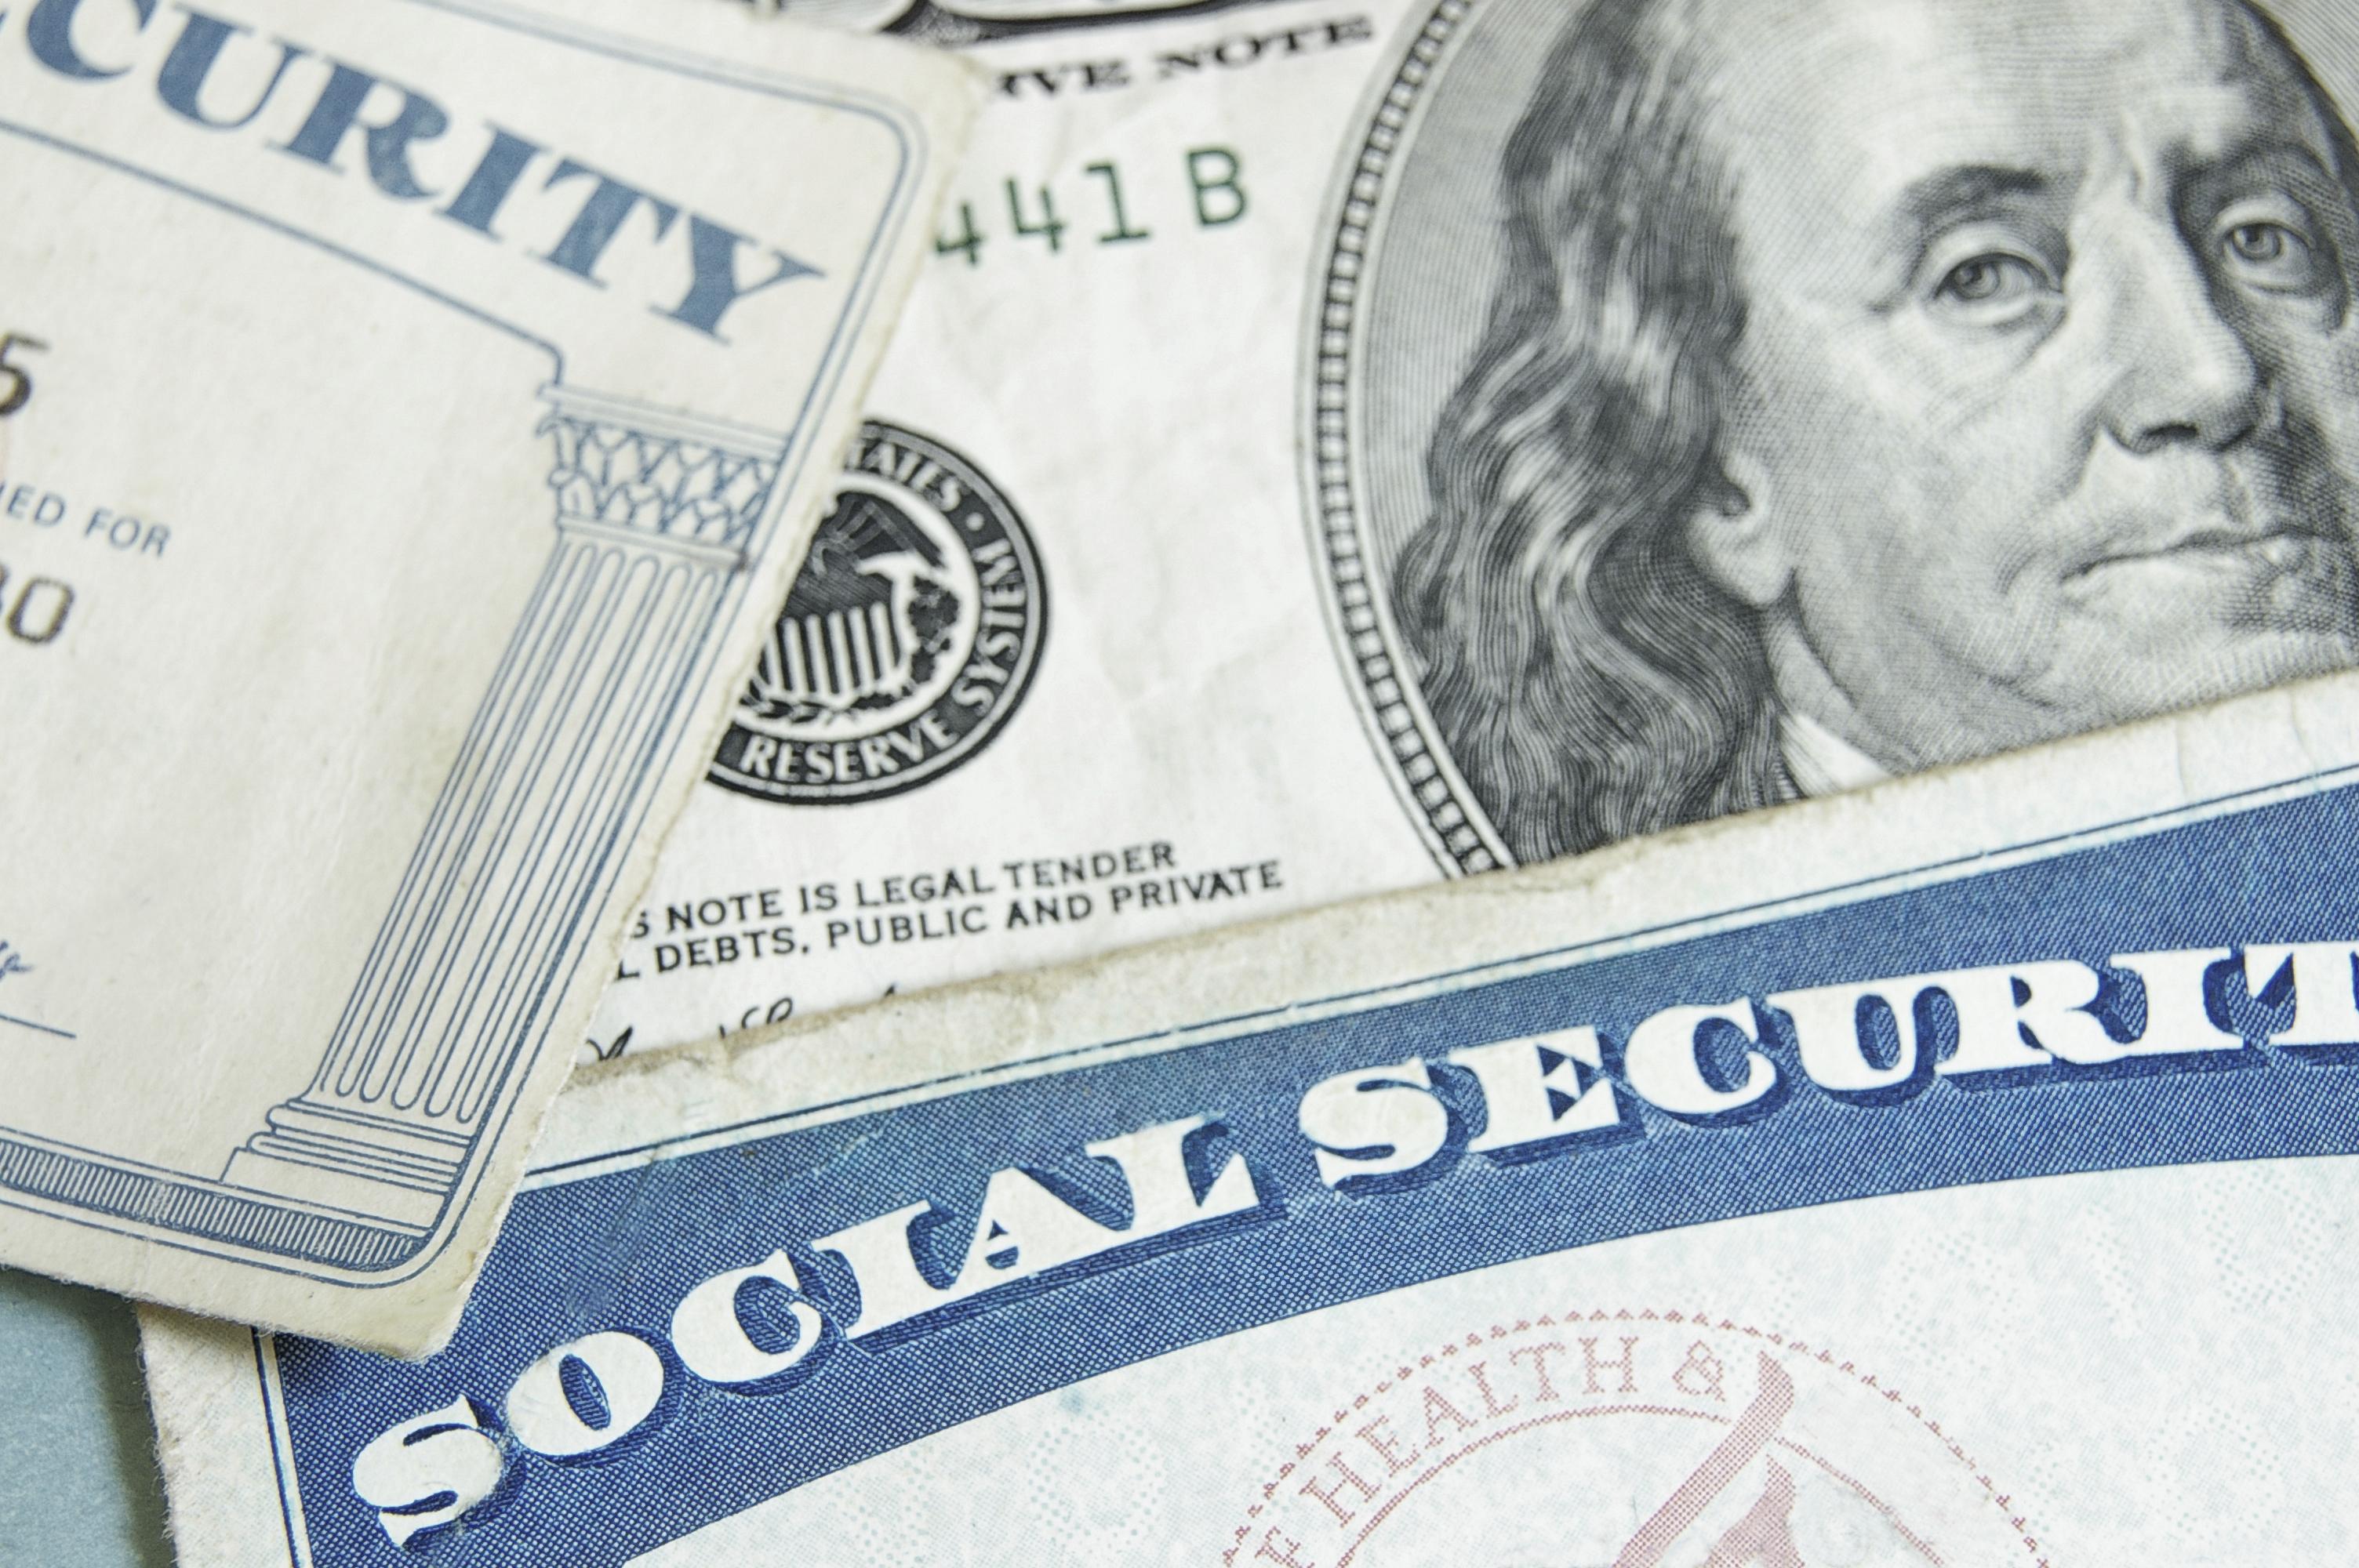 Social Security card next to a hundred-dollar bill